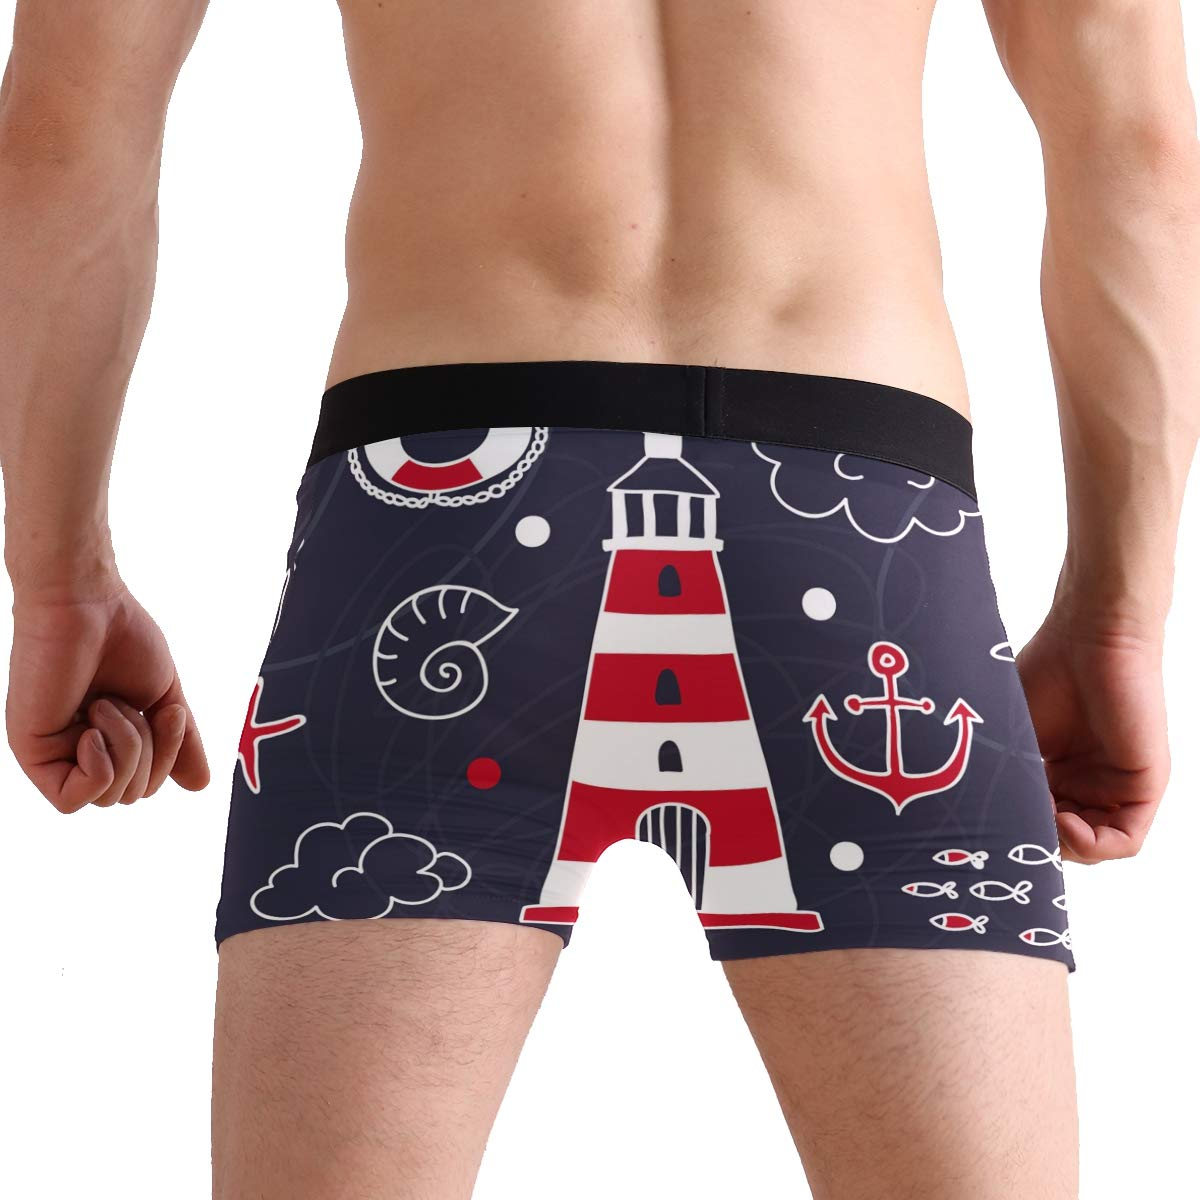 BETTKEN Mens Boxer Briefs Cute Nautical Anchor Set Lighthouse Short Underwear Soft Stretch Underpants for Men Boys S-XL